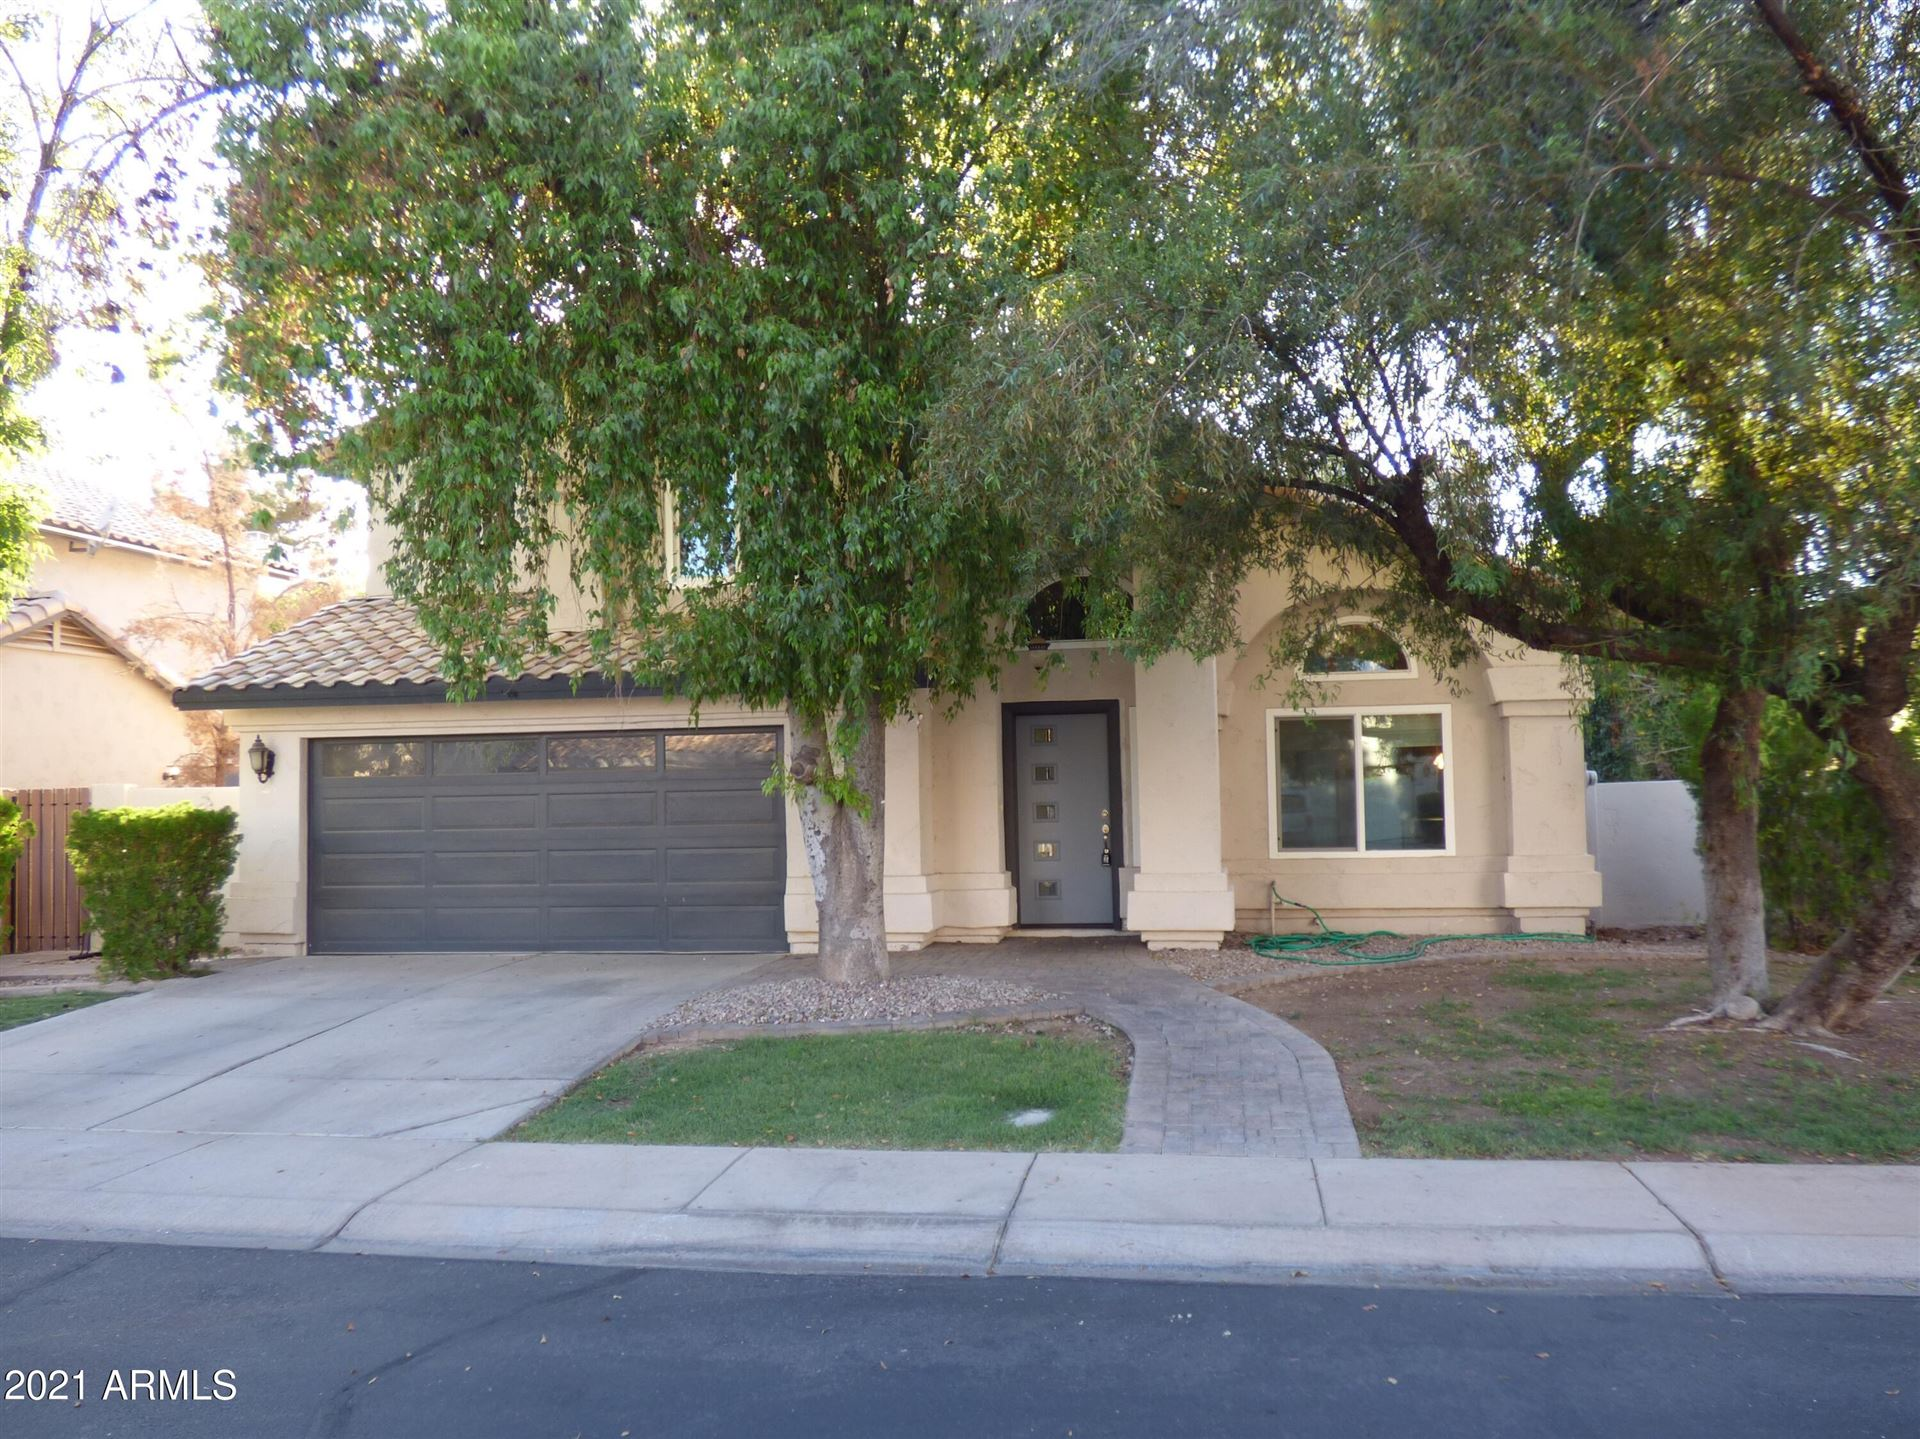 Photo of 936 N SEABORN Lane, Gilbert, AZ 85234 (MLS # 6249858)